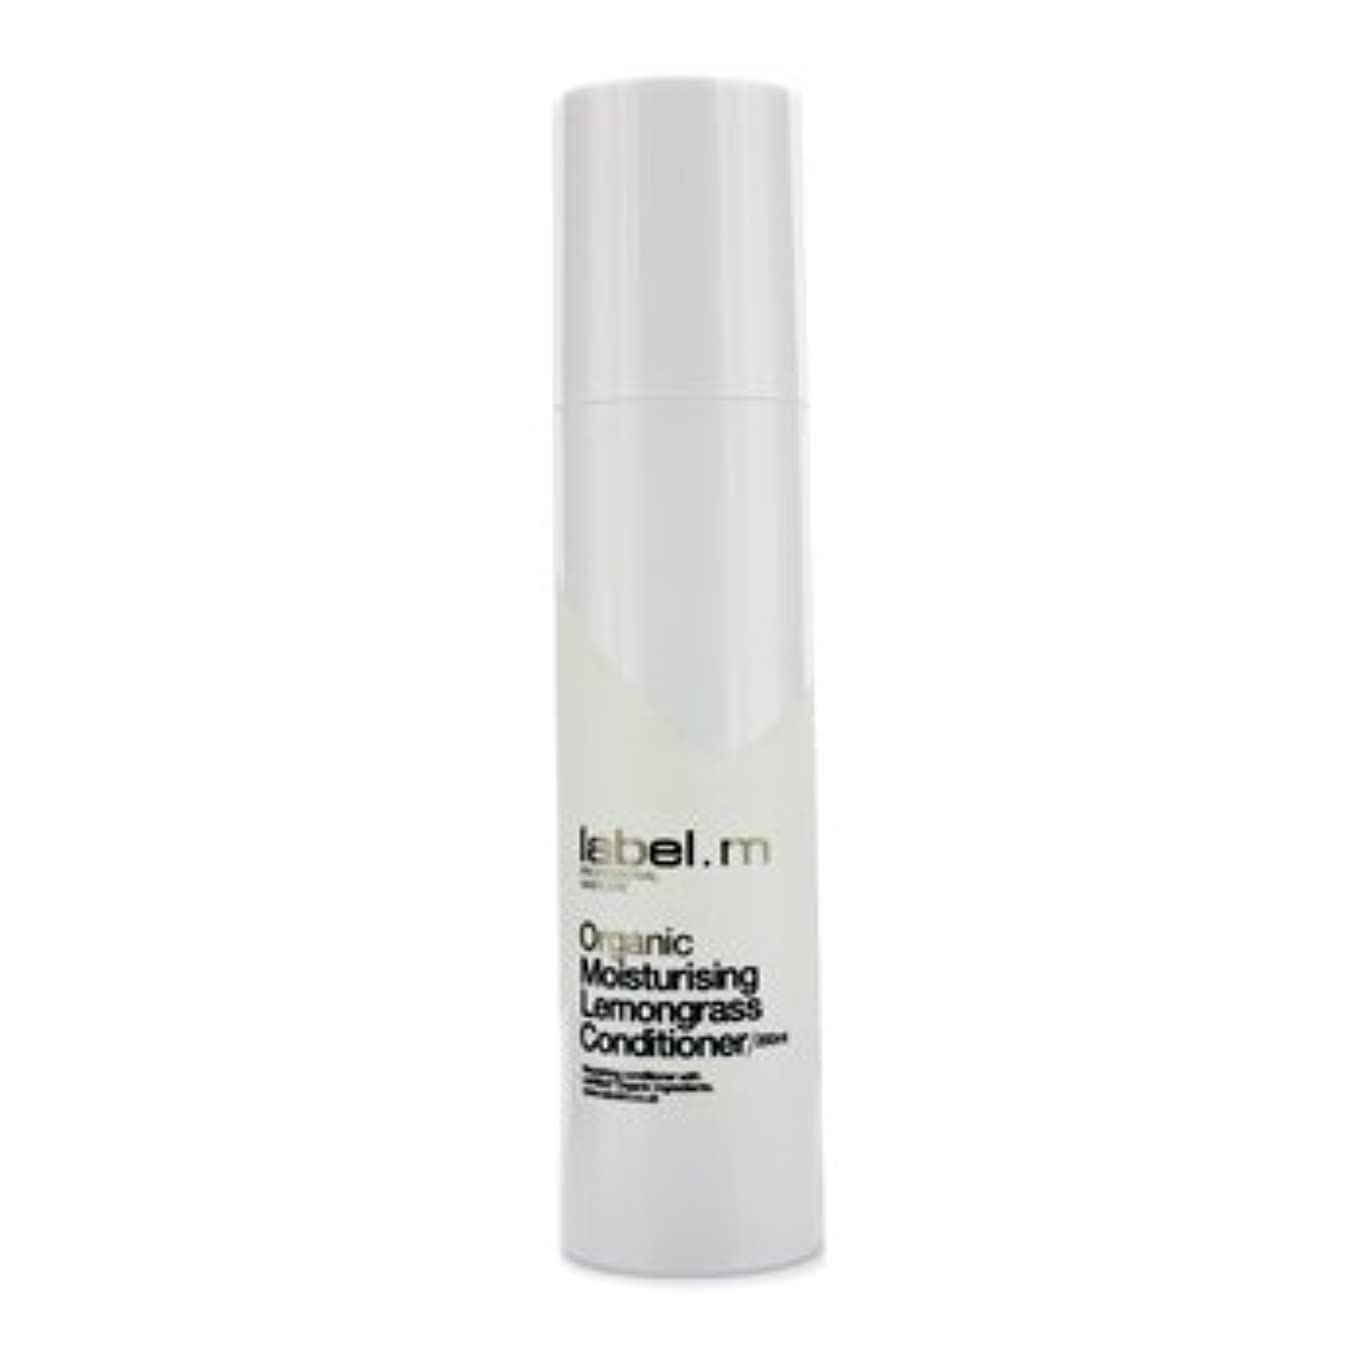 [Label M] オーガニック モイスチャライジング レモングラス コンディショナー 300ml/10.1oz